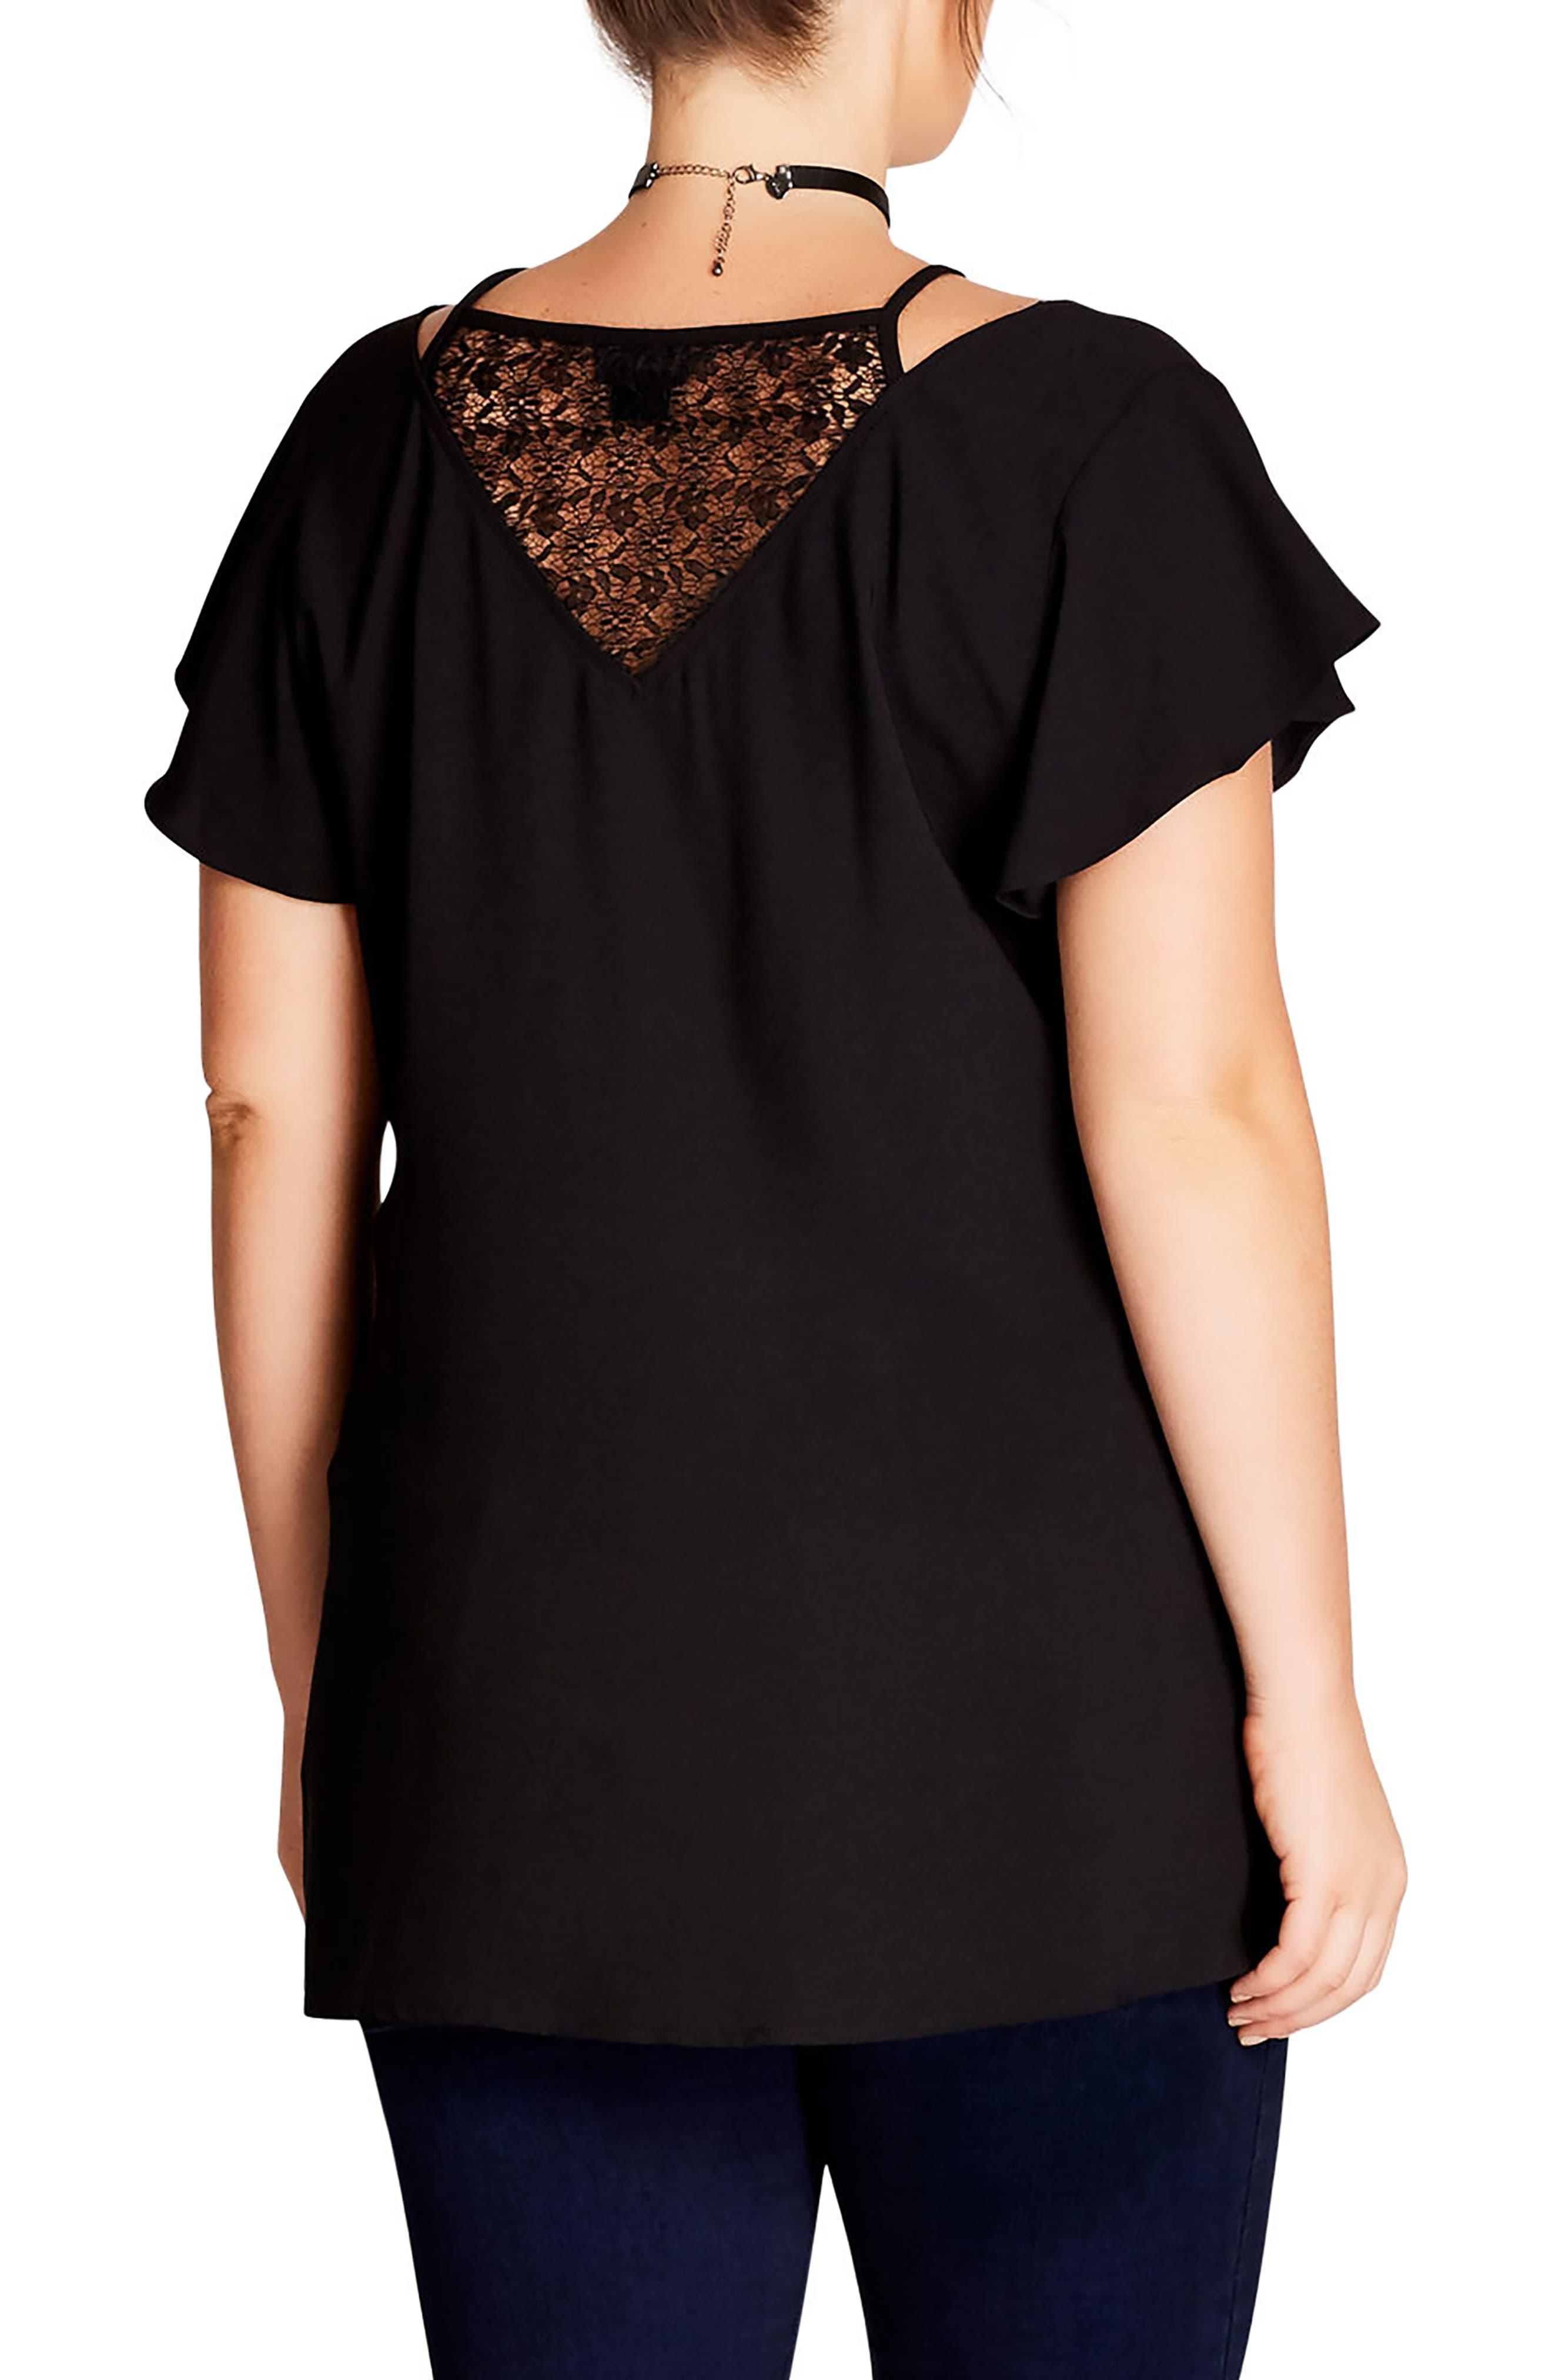 Alternate Image 2  - City Chic Lace Inset Top (Plus Size)